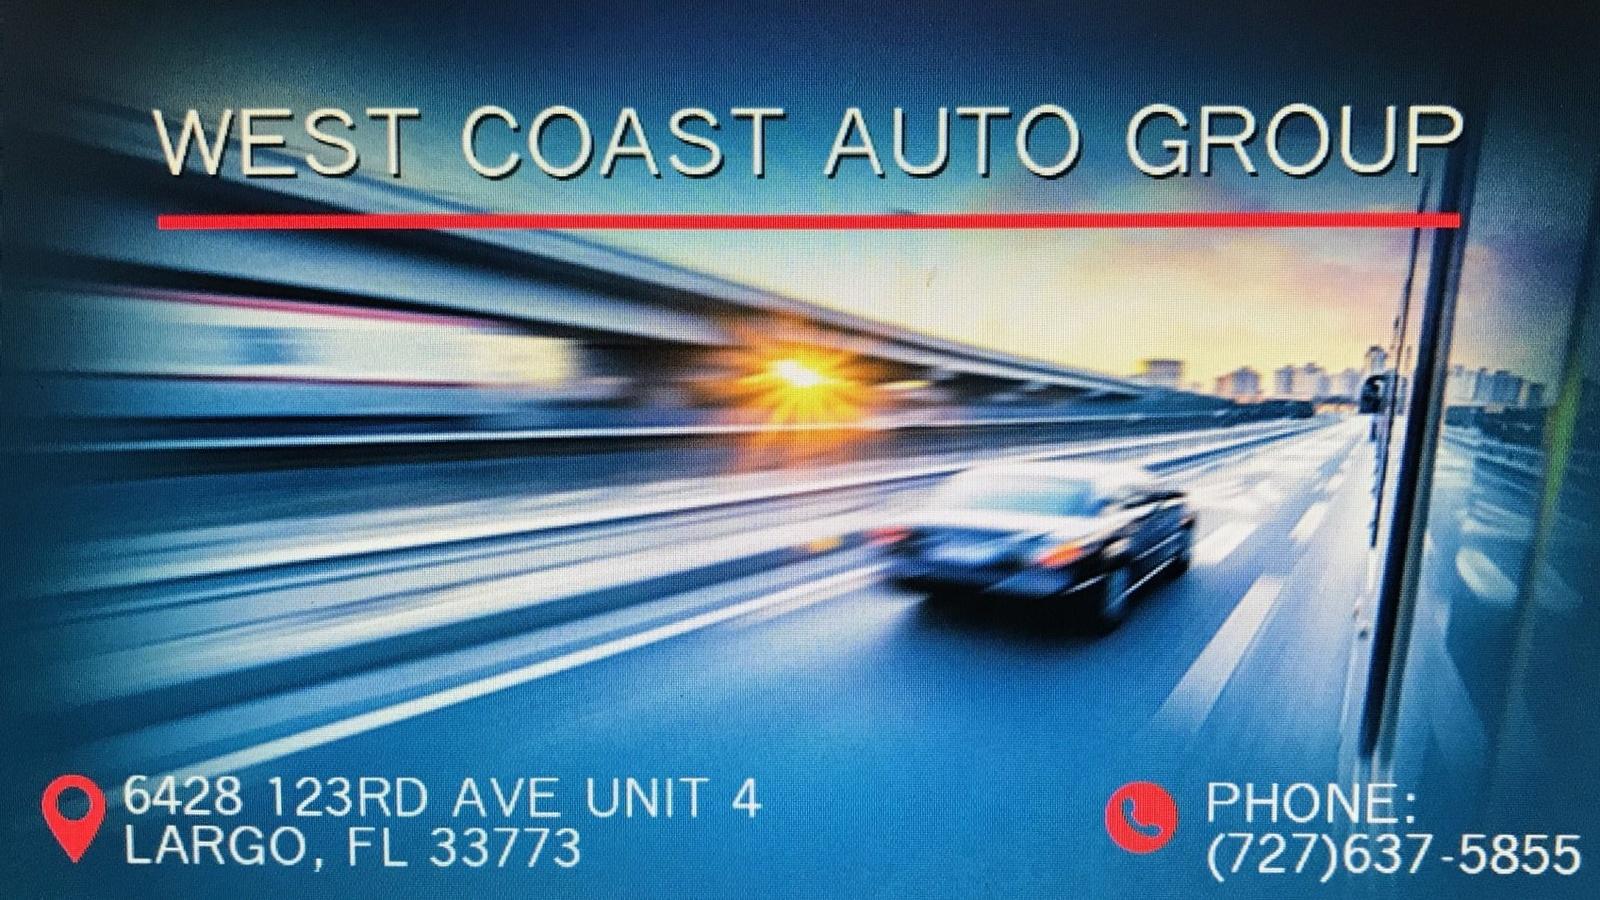 West Coast Auto >> West Coast Auto Group Largo Fl Read Consumer Reviews